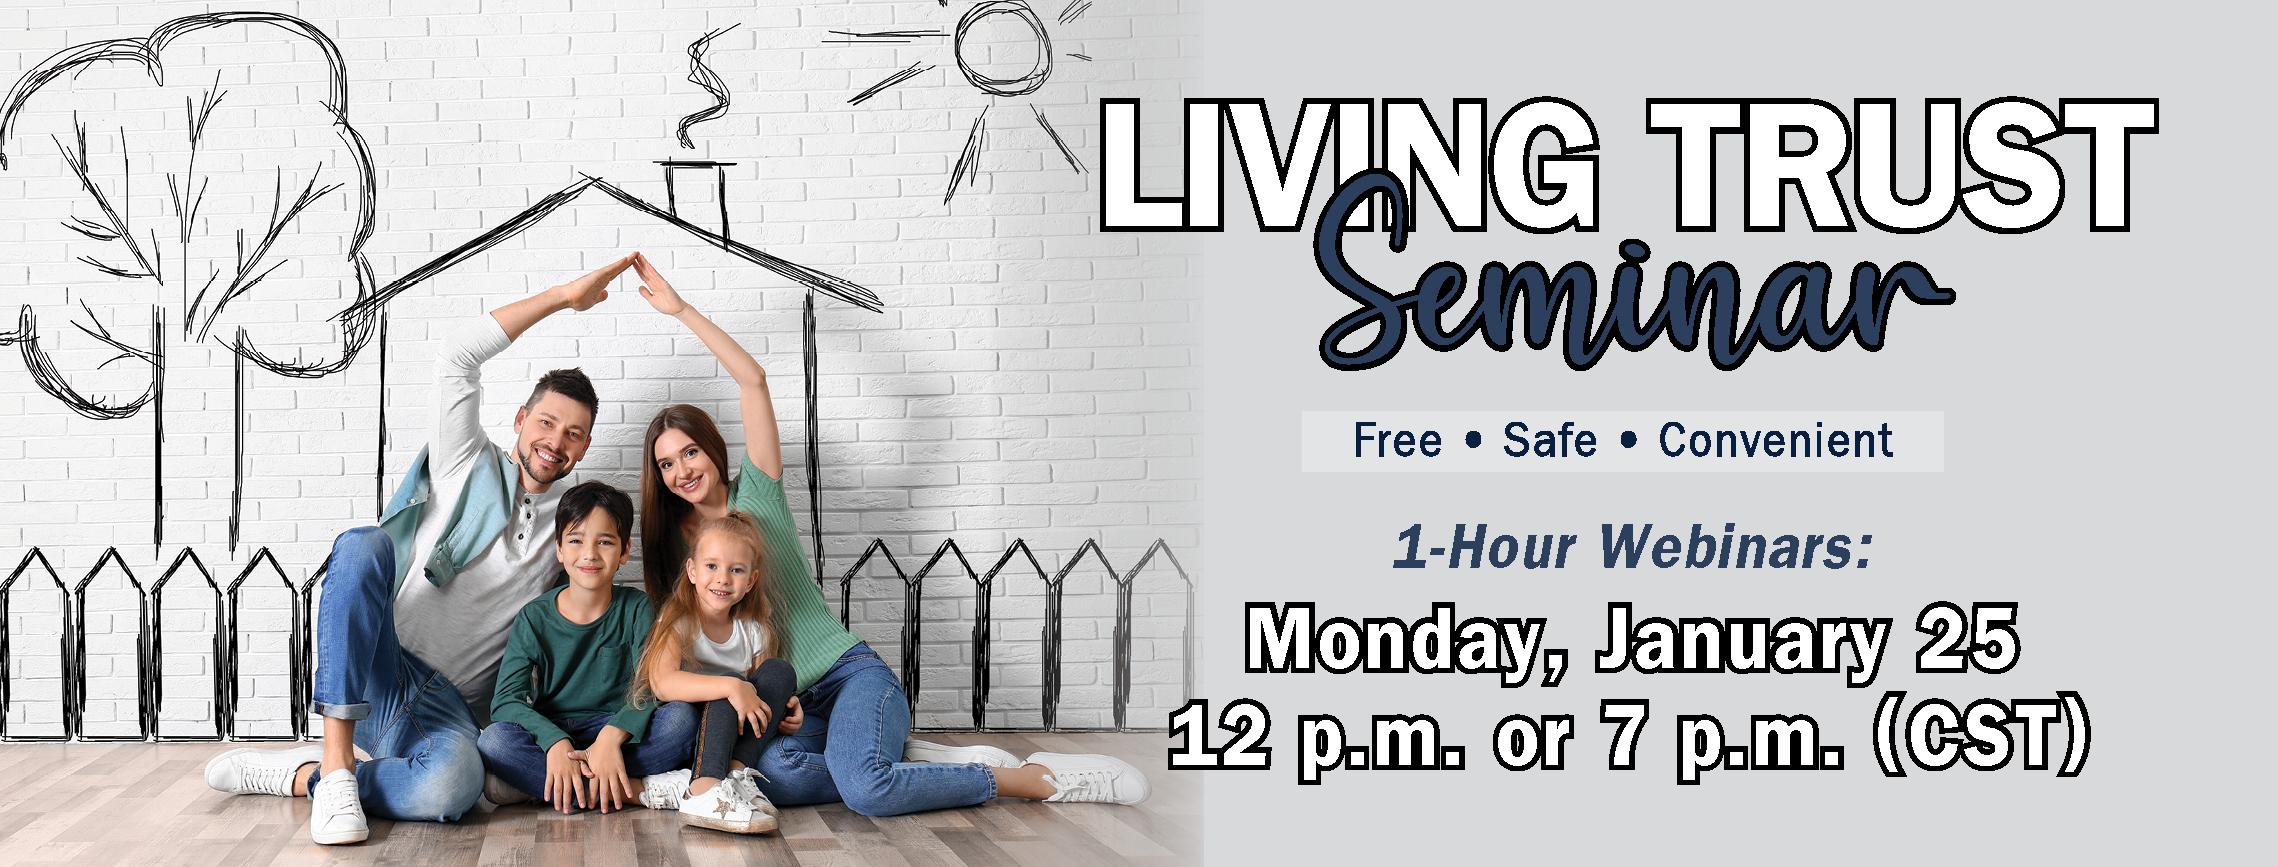 Spring 2021 Living Trust Seminar Banner